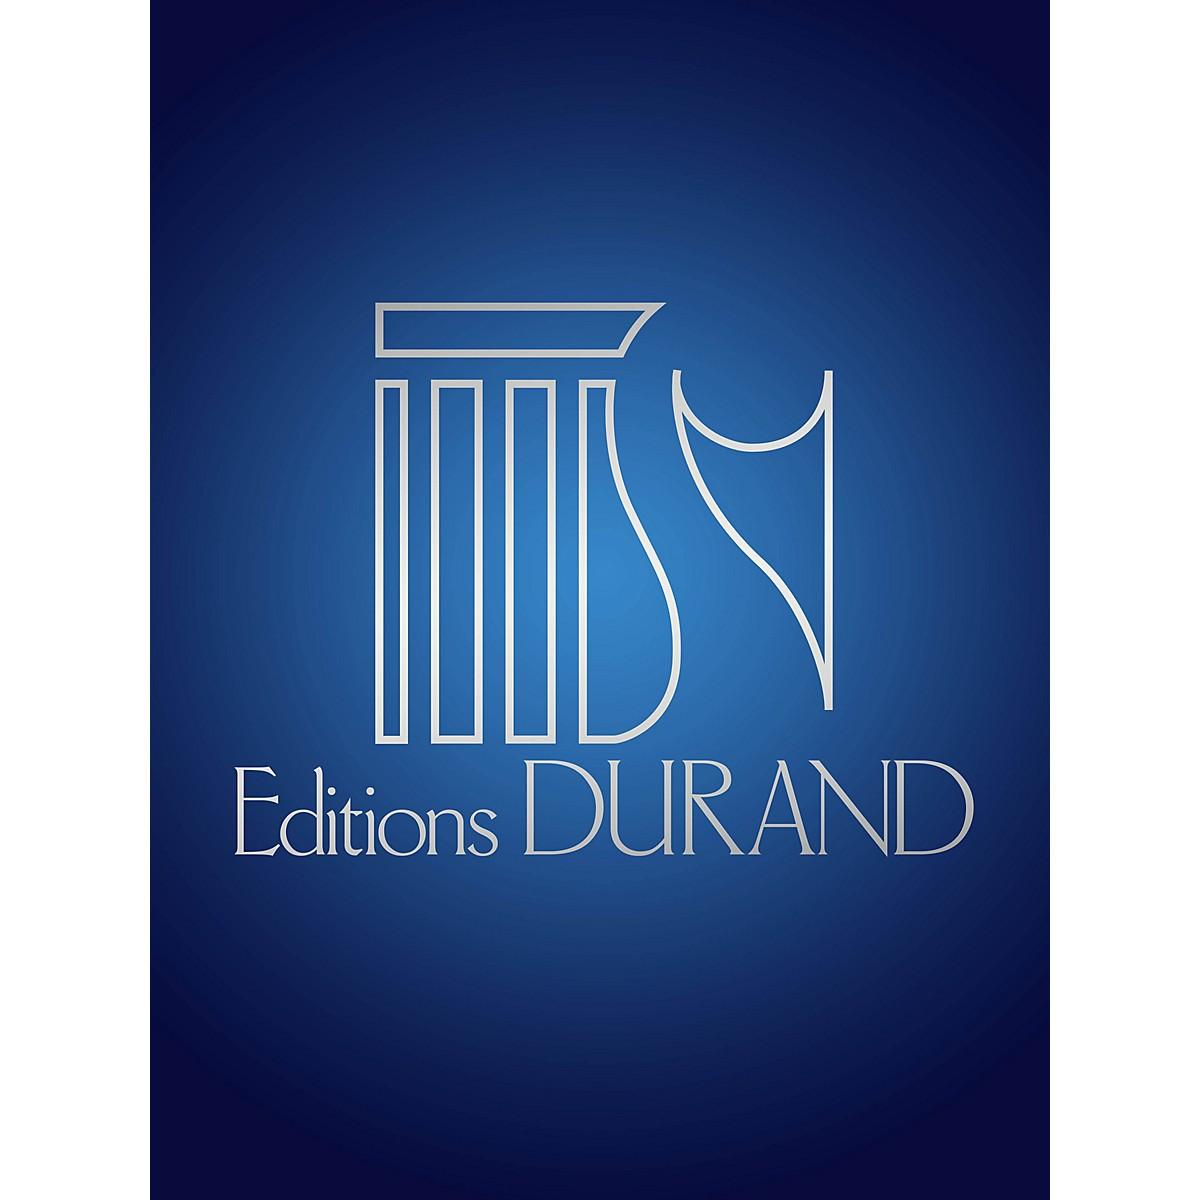 Hal Leonard Arabesque No1 2 Piano 8 Hands Editions Durand Series by Claude Debussy